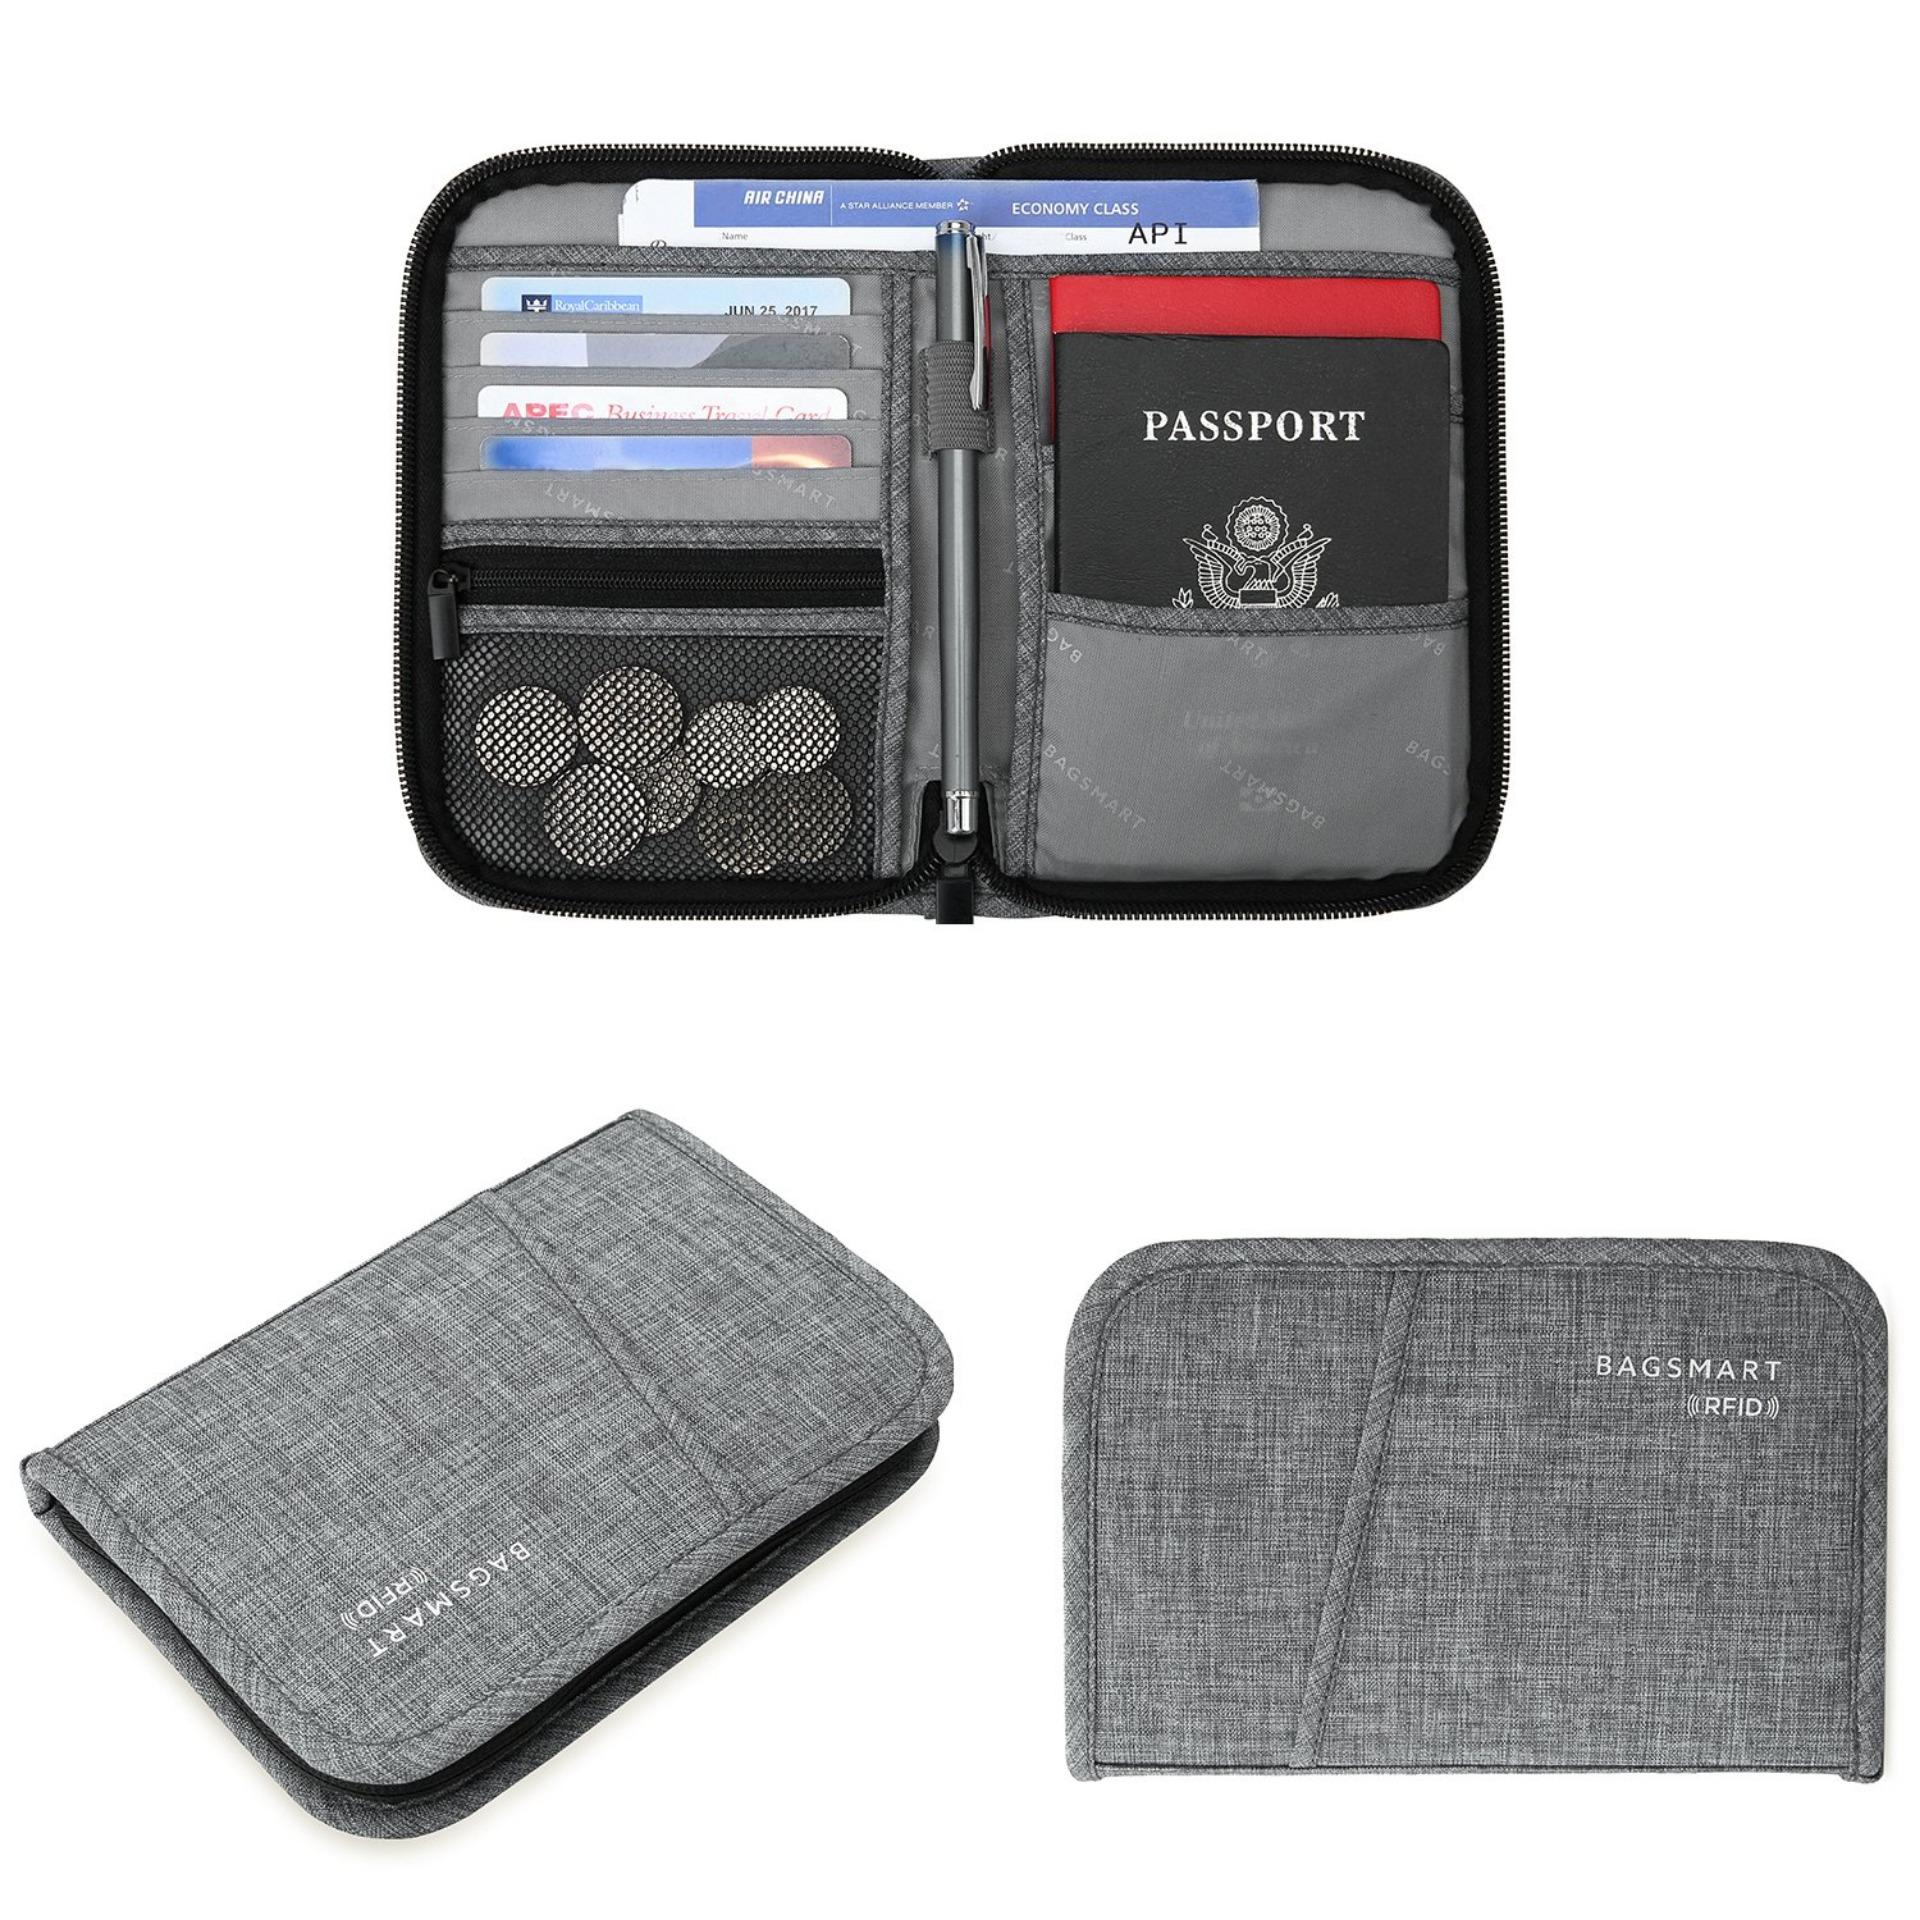 f1fb0fd5f5f1 BAGSMART BM0200093A008 TRAVEL RFID BLOCKING WALLET PASSPORT HOLDER COVER  CREDIT CARD ORGANIZER